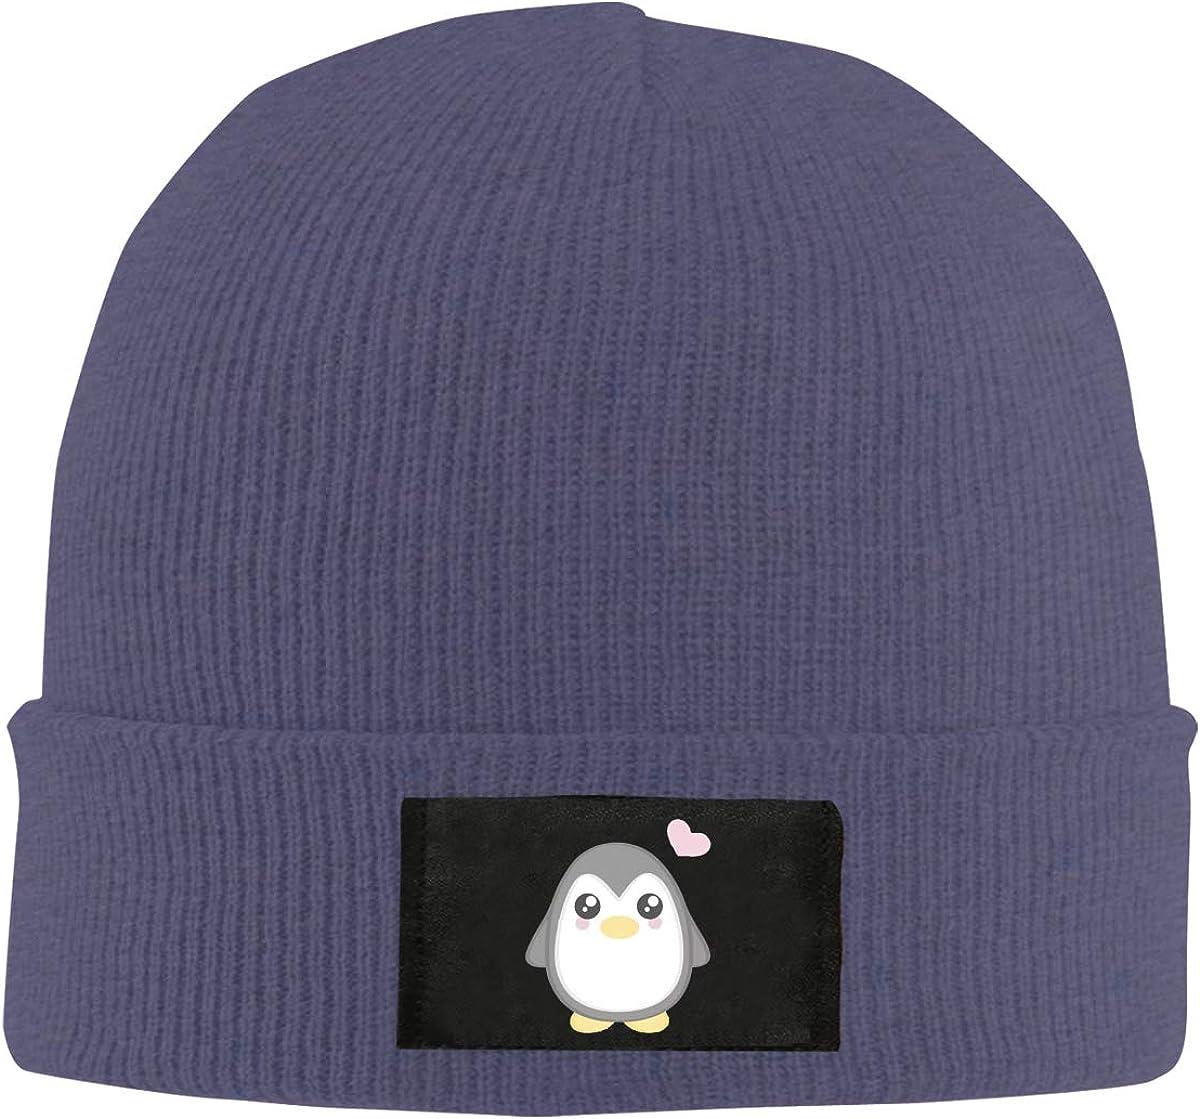 Unisex Stylish Slouch Beanie Hats Black Cute Penguin Top Level Beanie Men Women